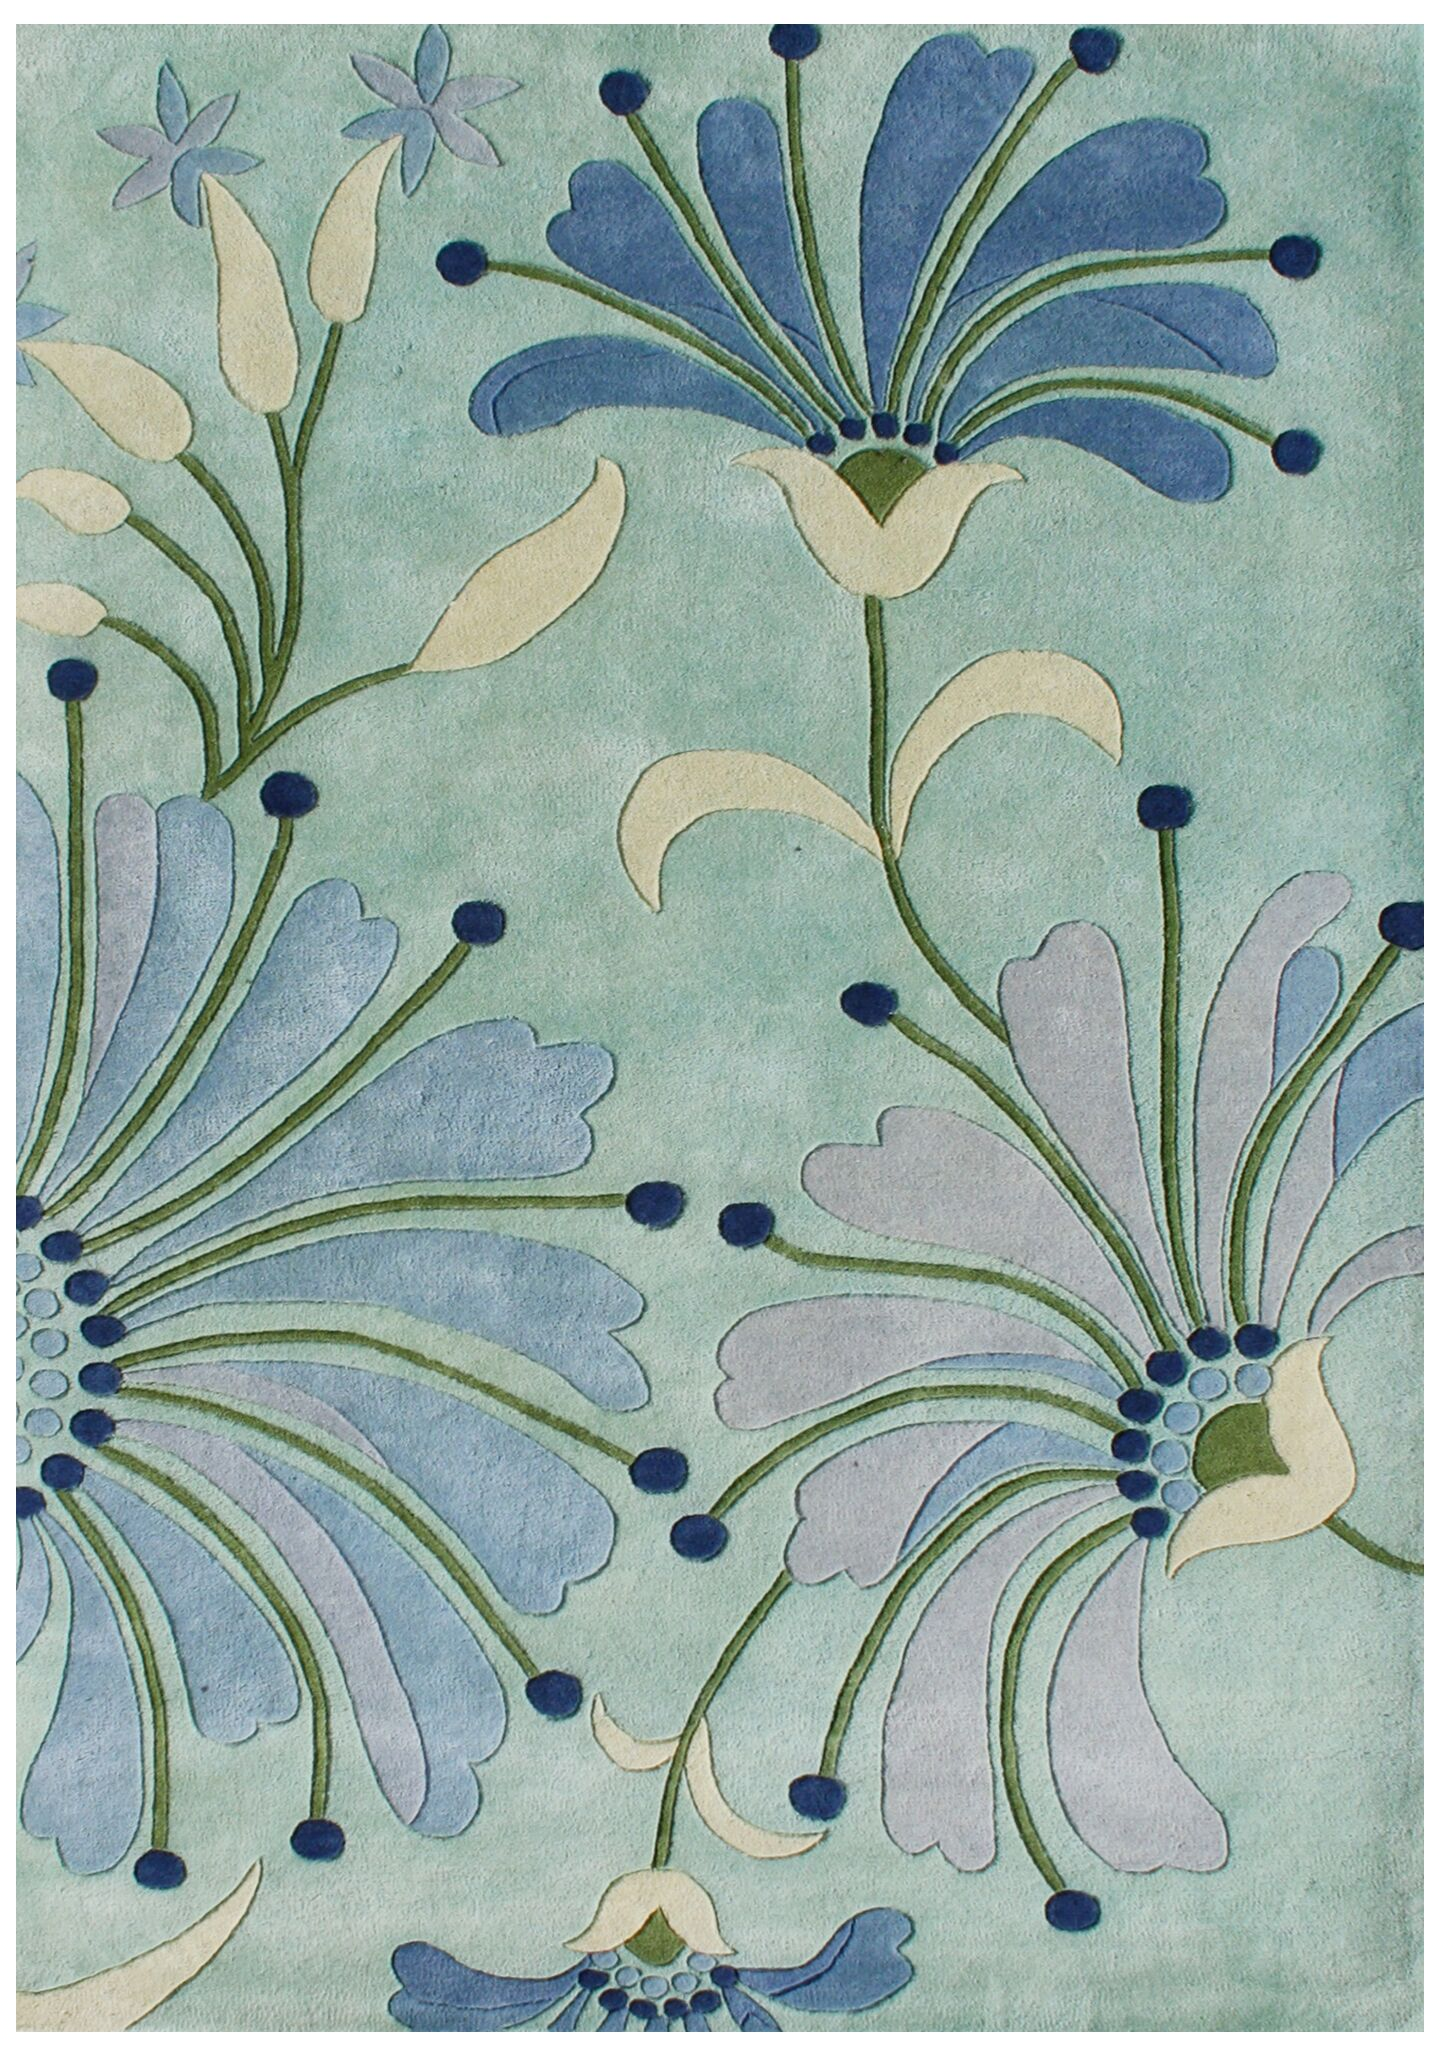 Giovanni Hand-Tufted Nile Blue Area Rug Rug Size: Rectangle 8' x 10'